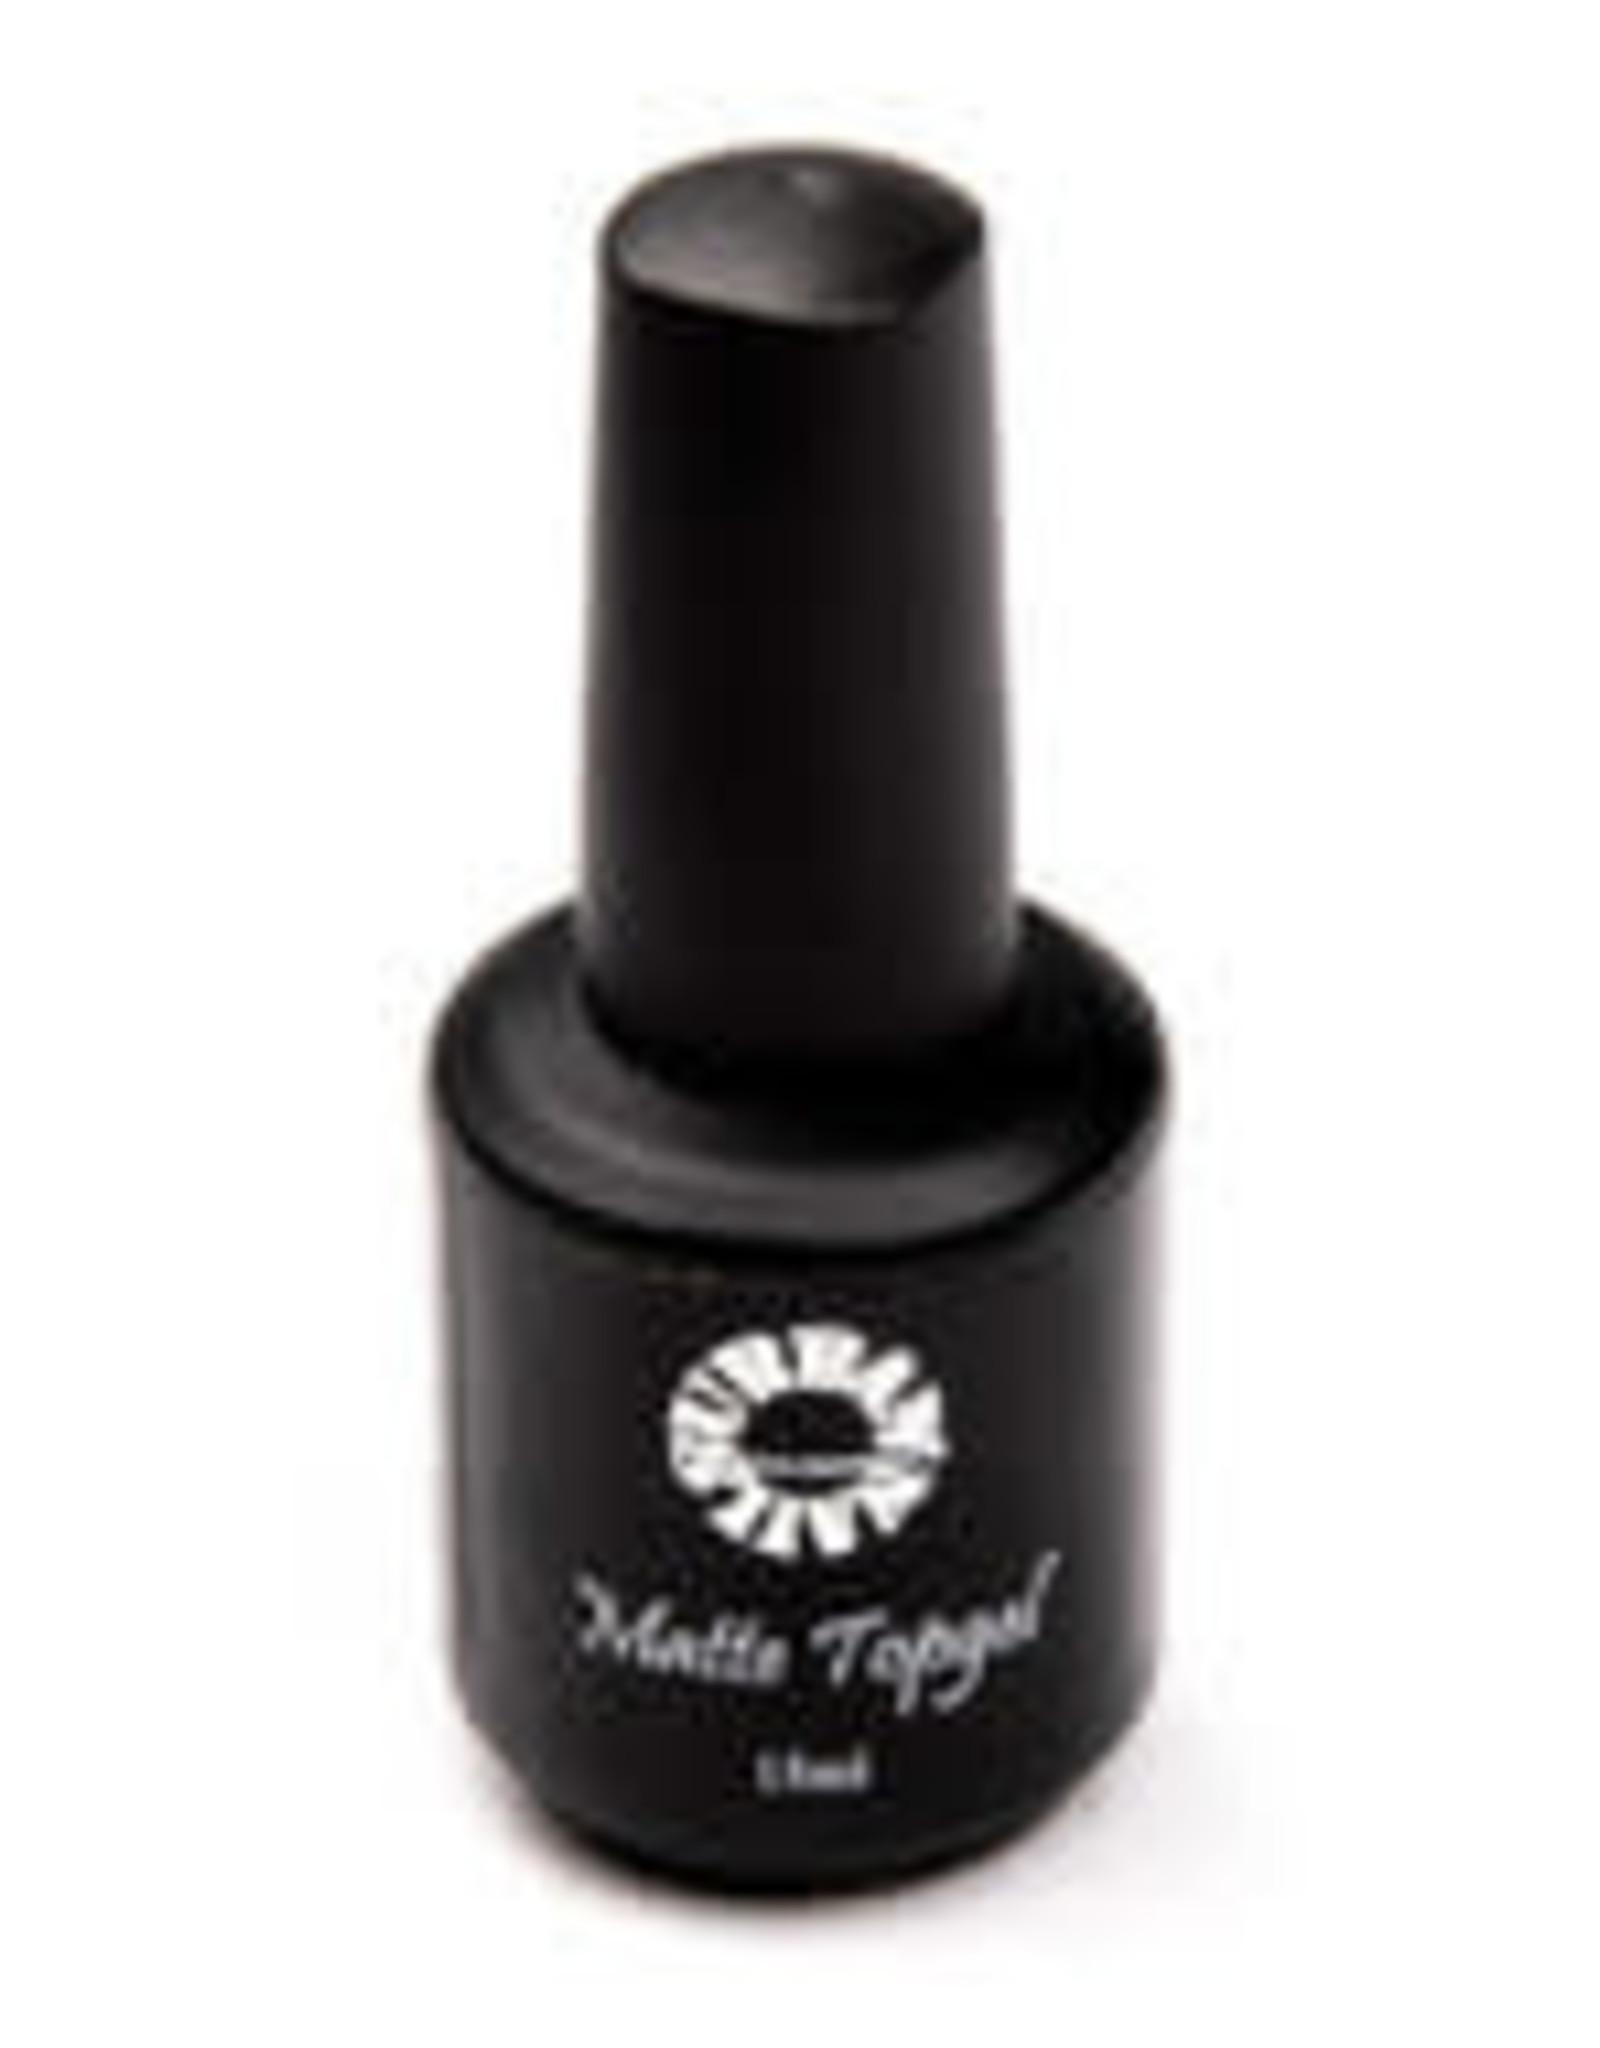 Urban Nails Matte Top Gel